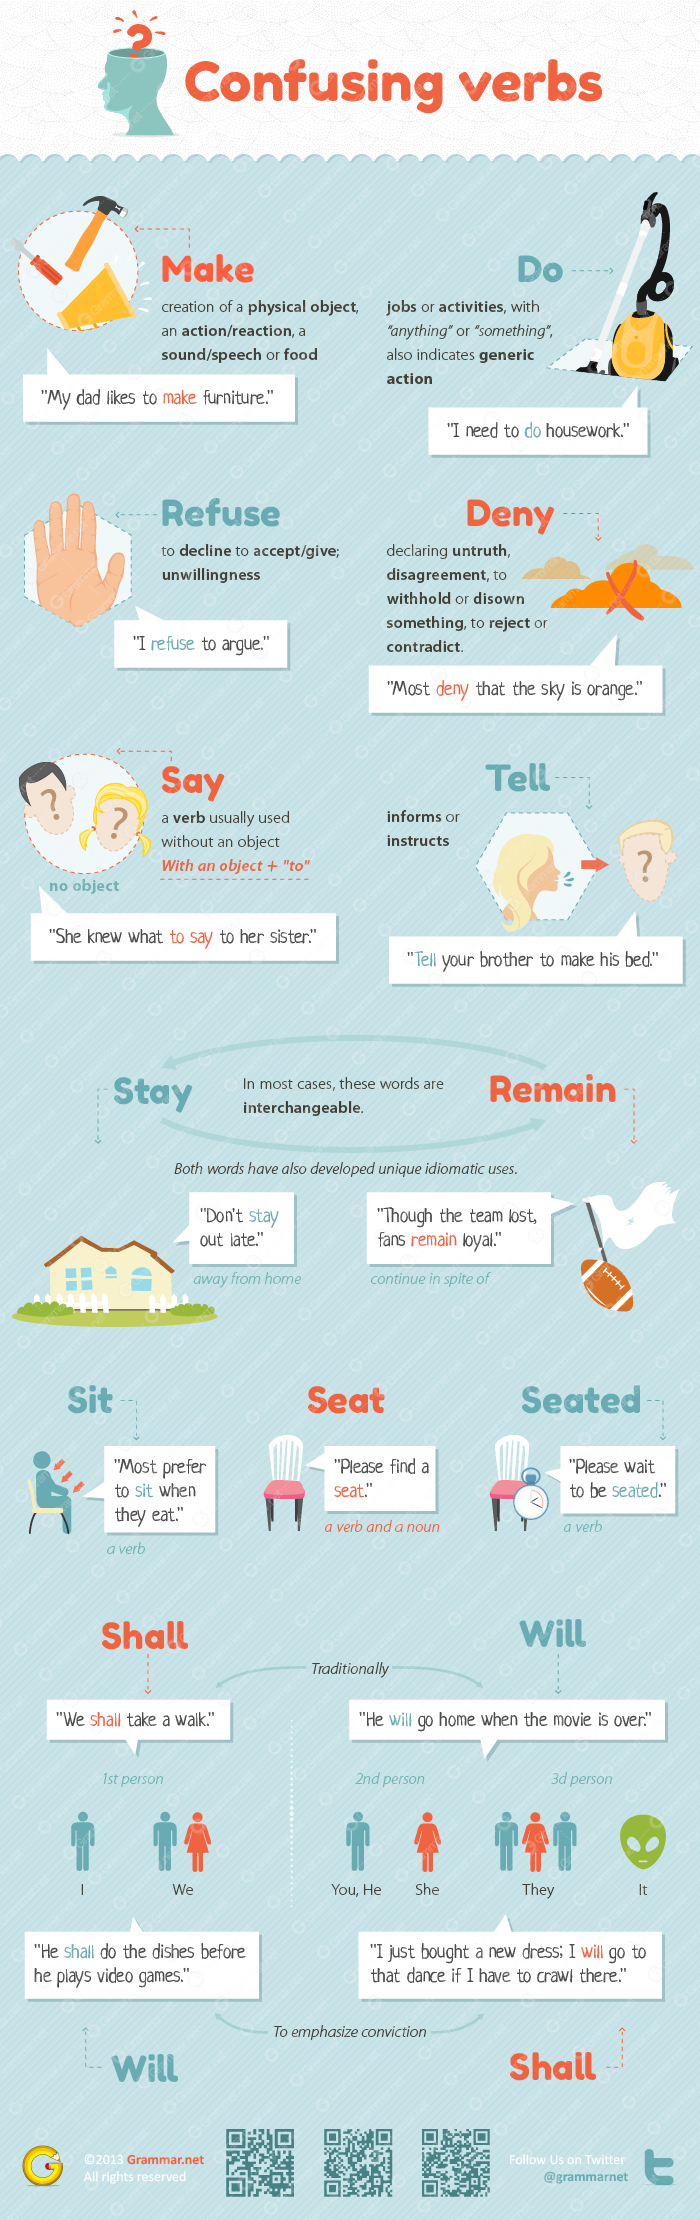 15 Confusing Verbs in English - MyEnglishTeacher.eu